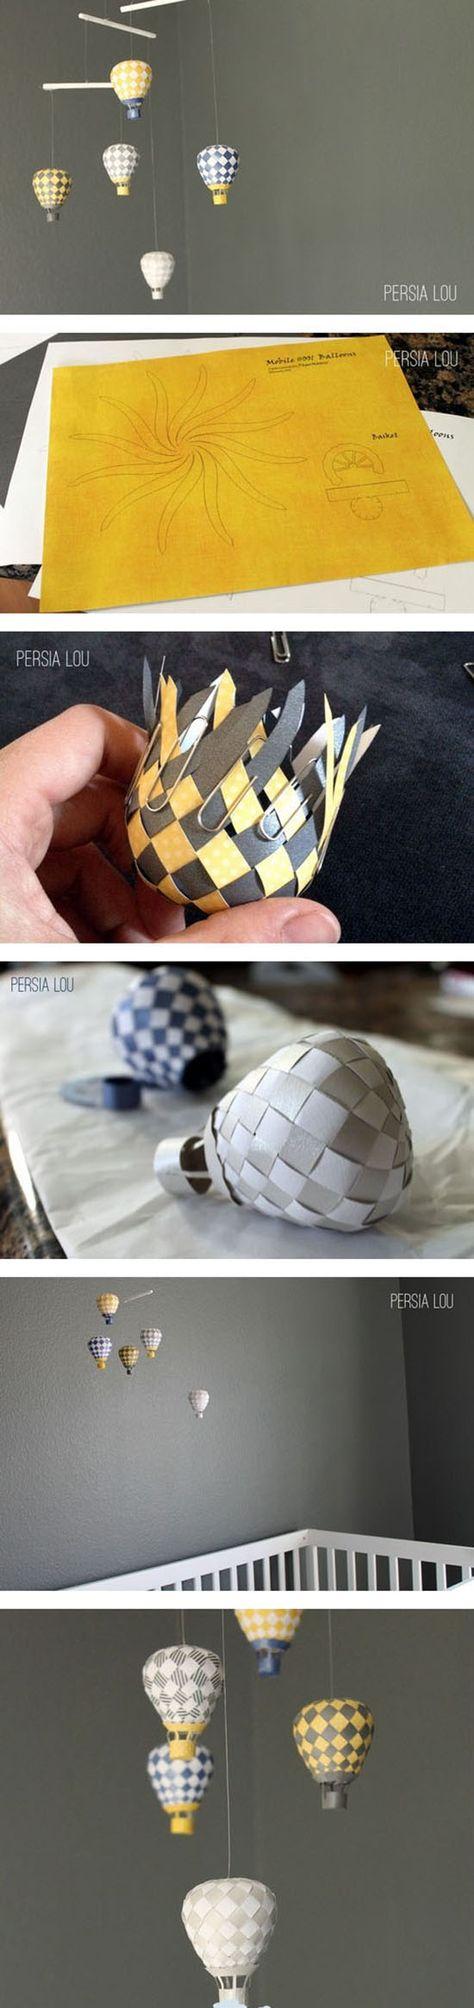 Diy Cute Fire Balloon | DIY & Crafts